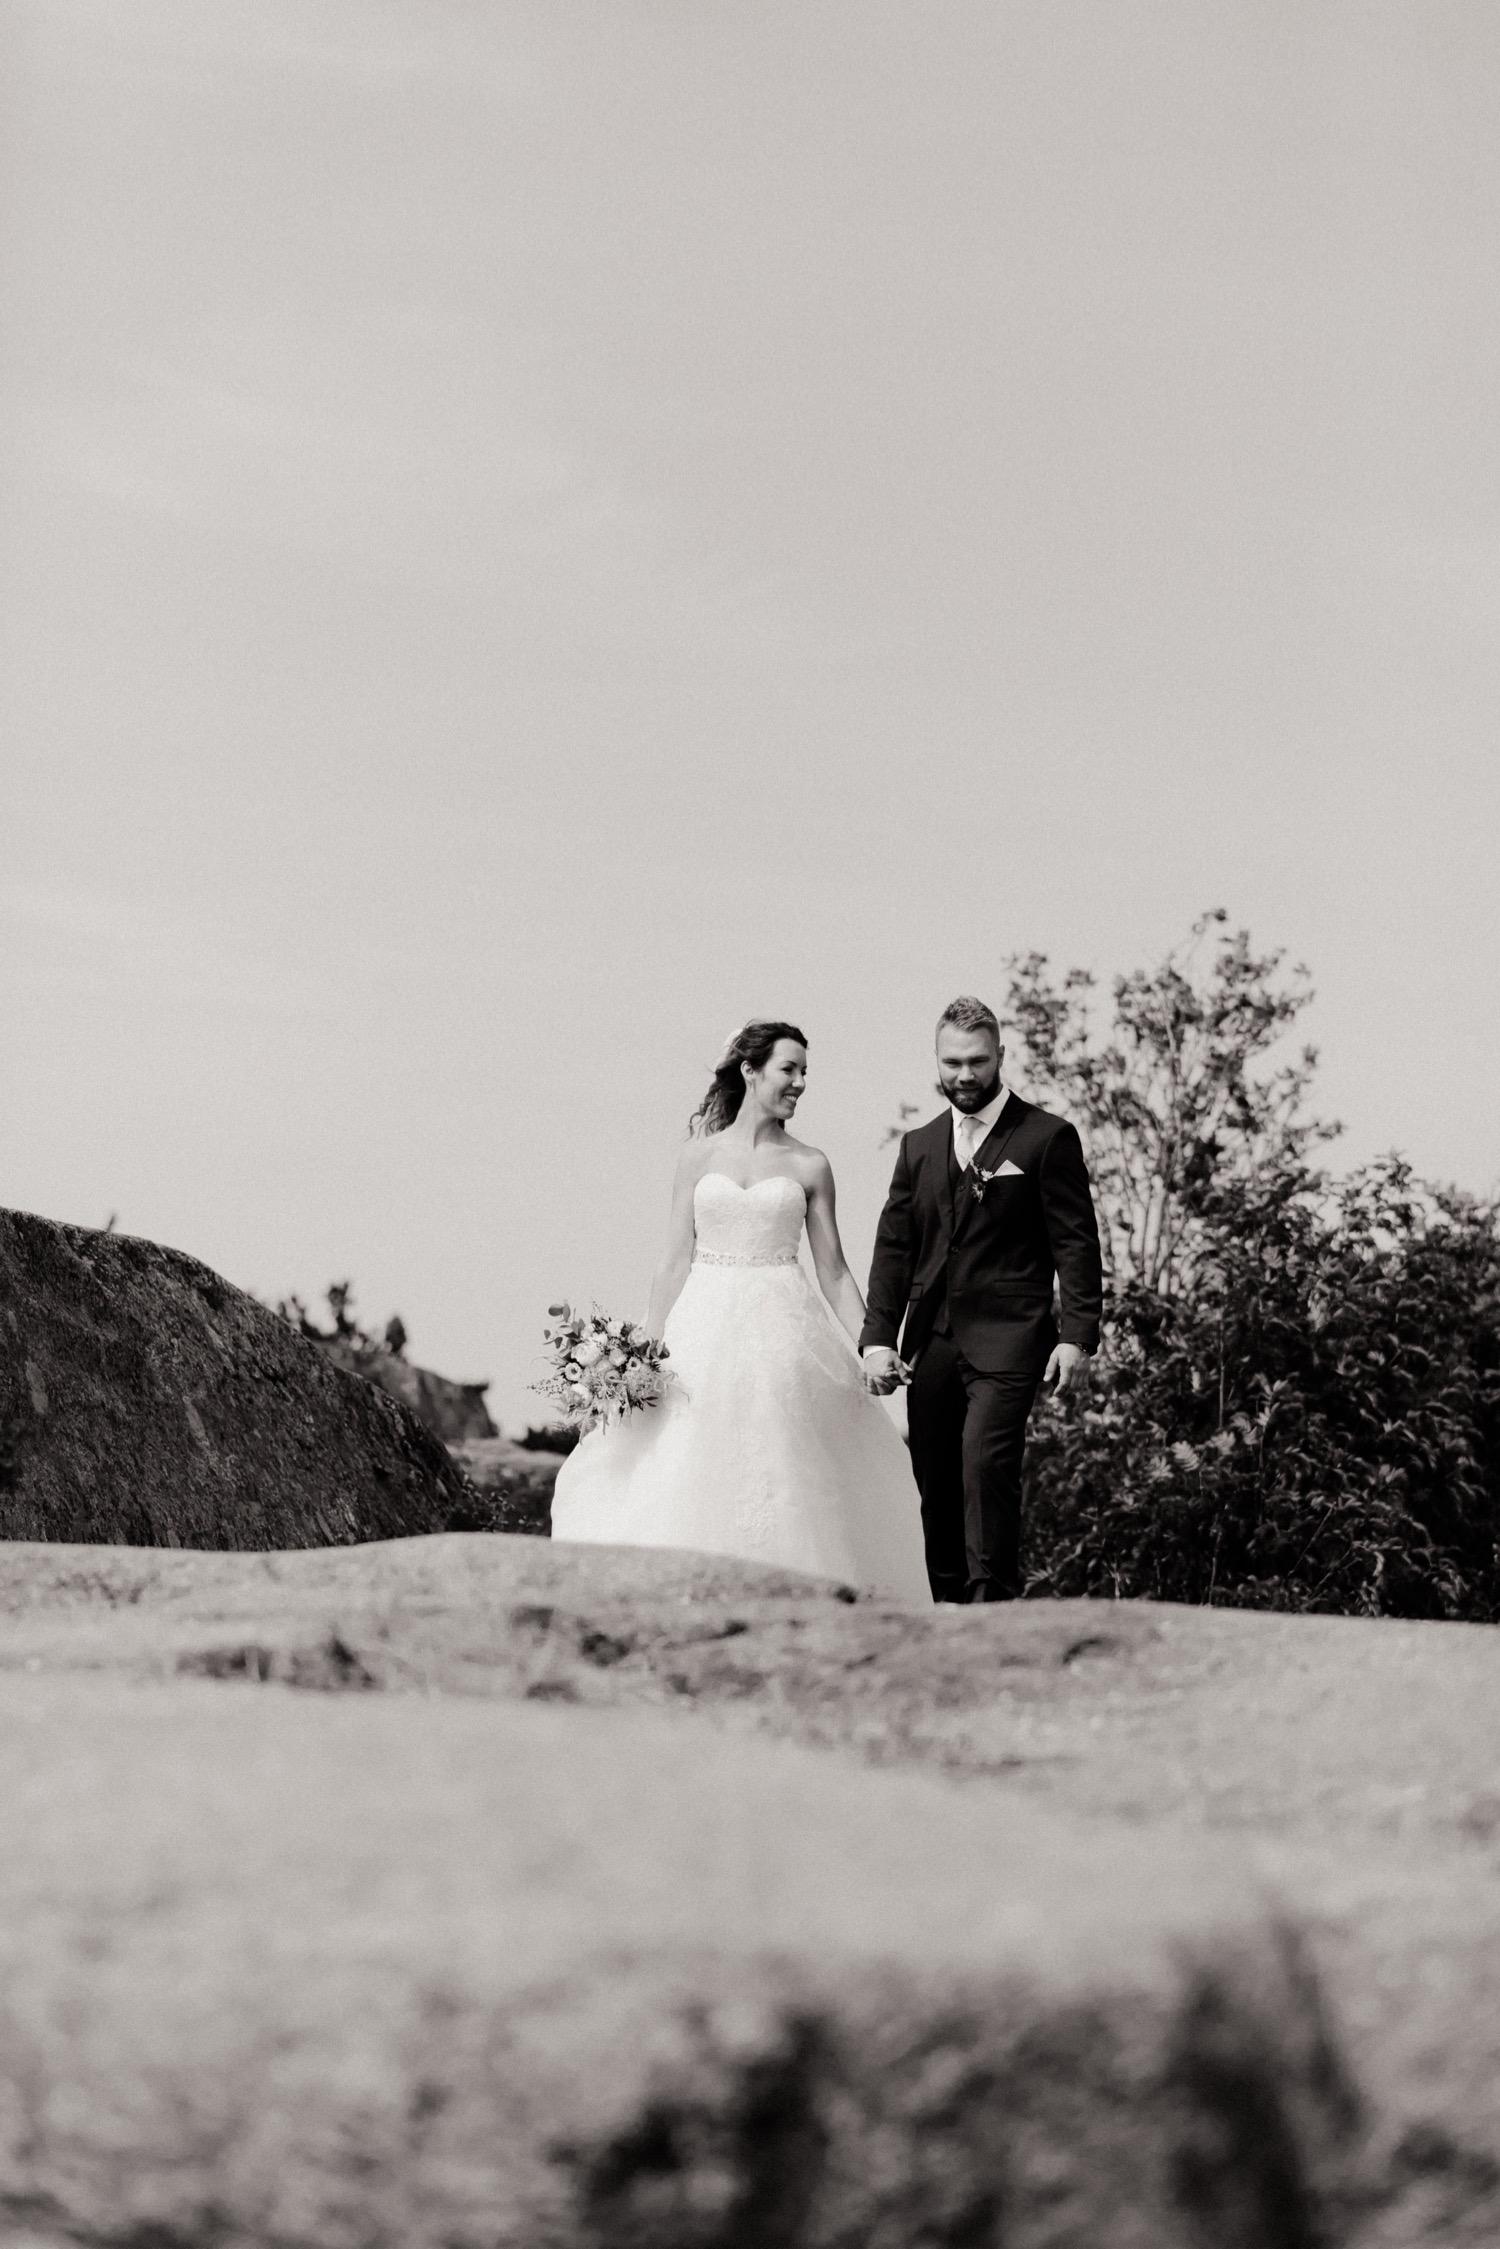 059_weddingphotographer_Bryllupsfotografering_Bryllupsbilder_fatmonkeyfoto_Bryllupsfotograf.jpg